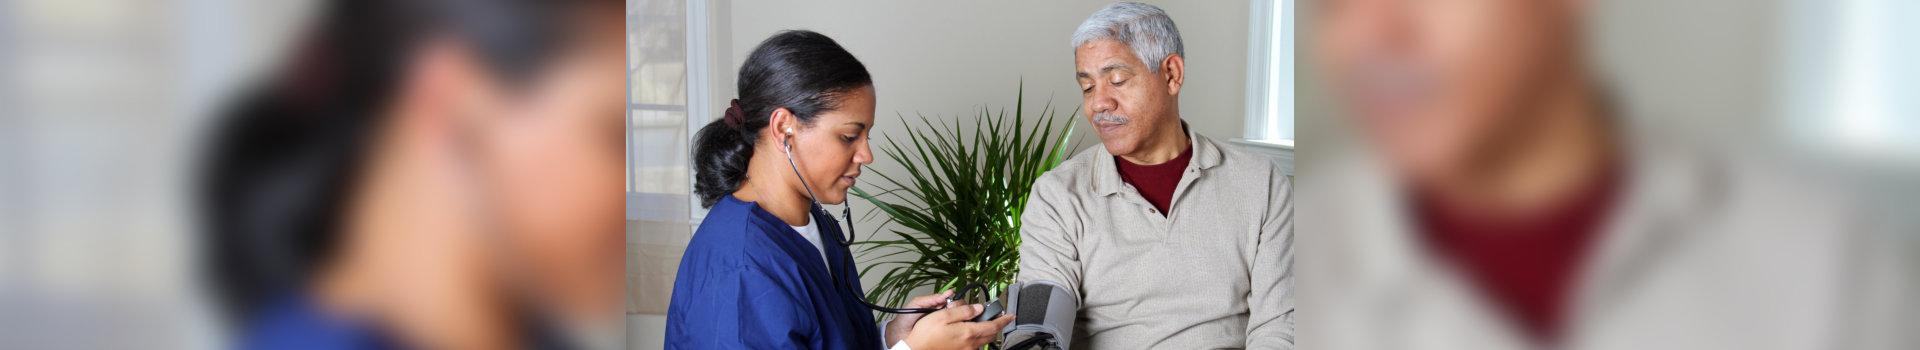 caregiver checking blood pressure of old man